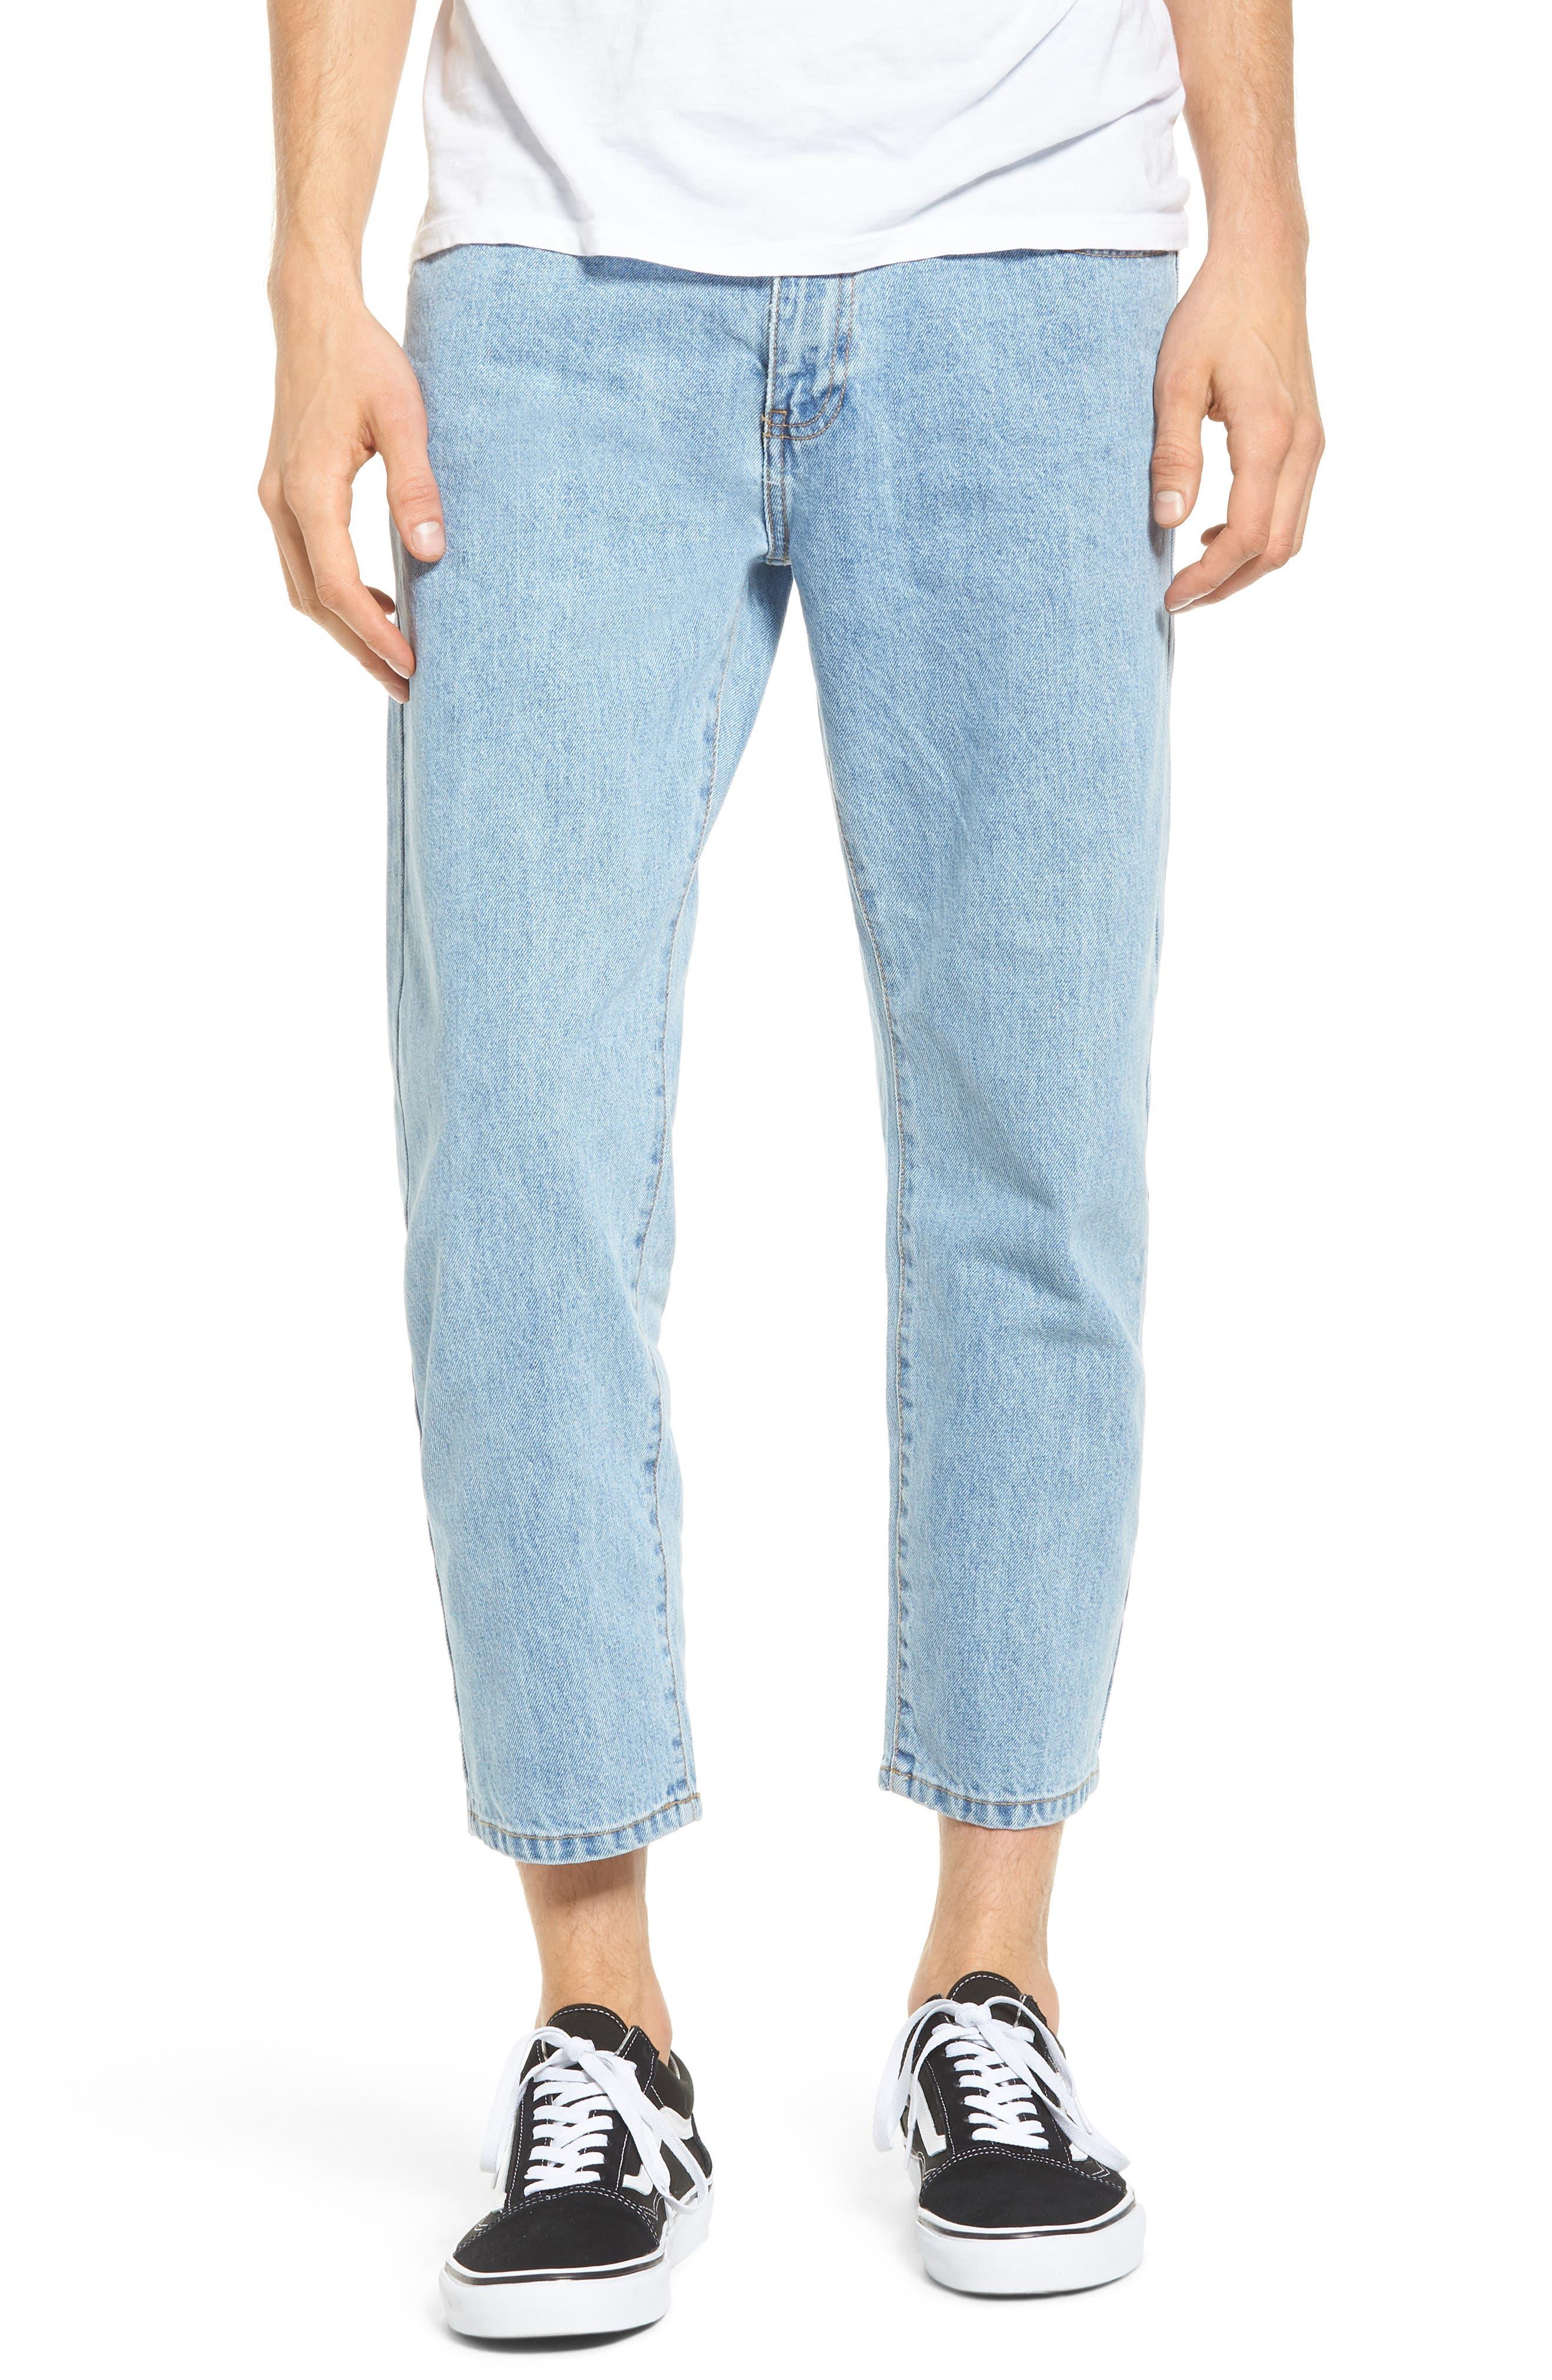 Otis Straight Fit Jeans,                             Main thumbnail 1, color,                             400